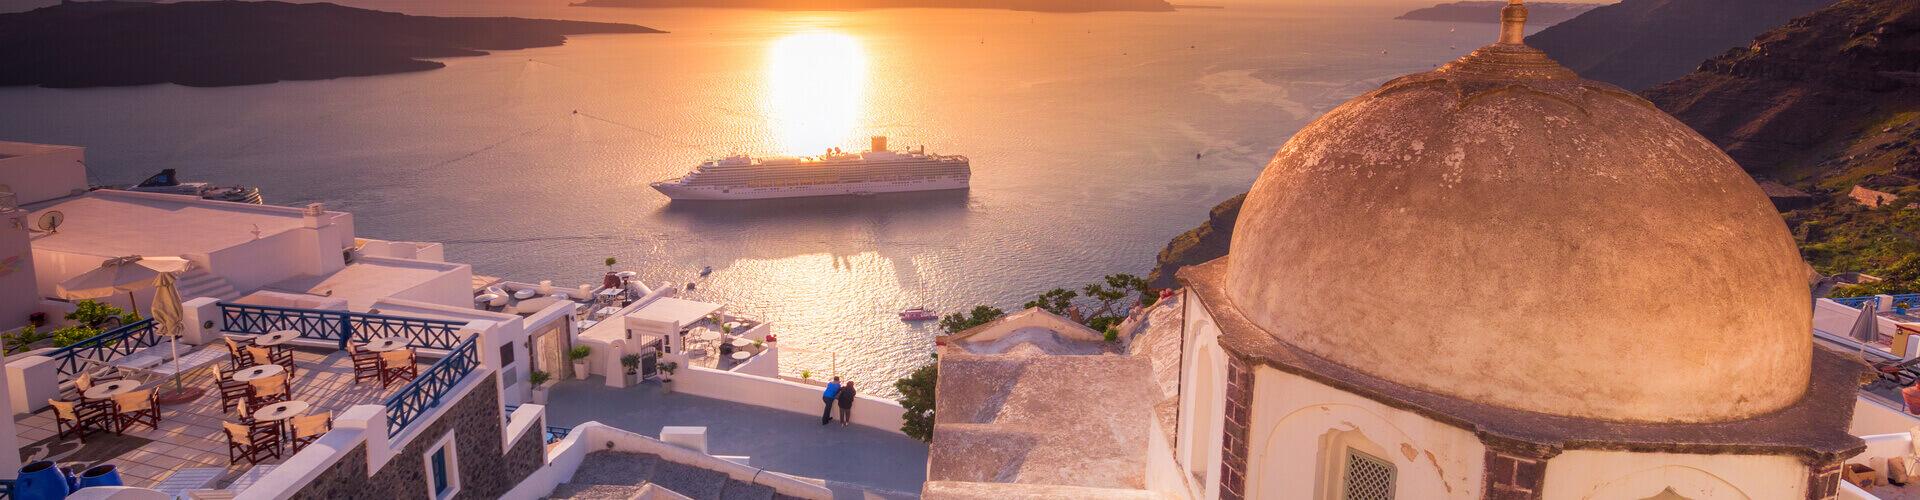 Santorini-Sunset-Kamari-Tours-Excursions